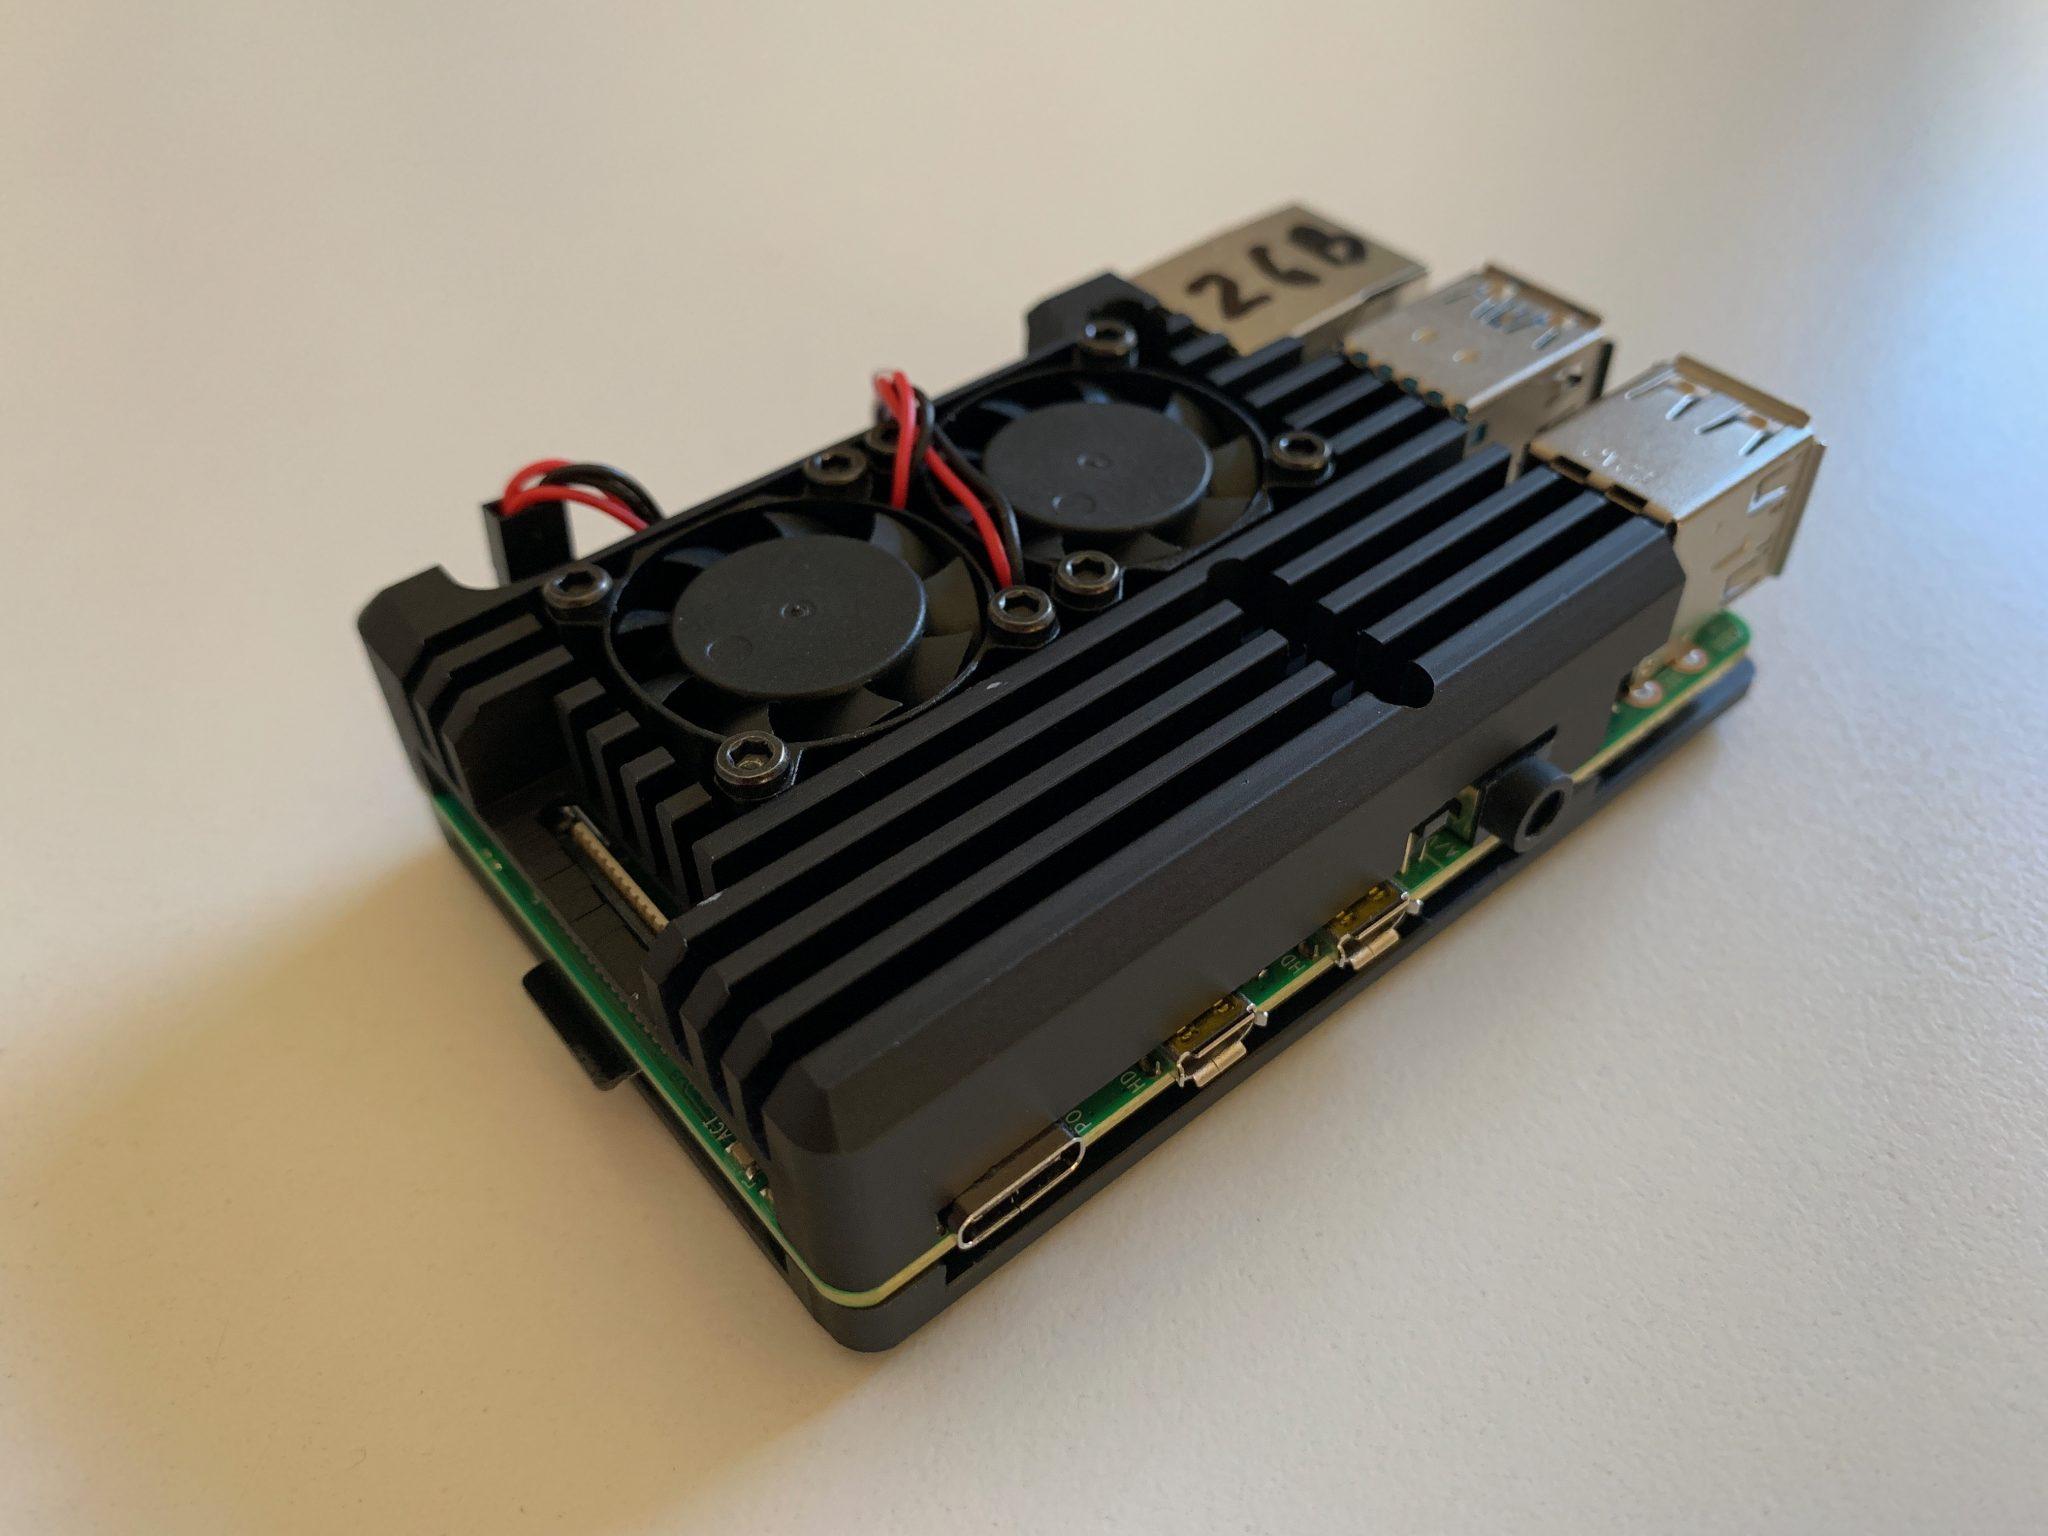 Case HDMI side